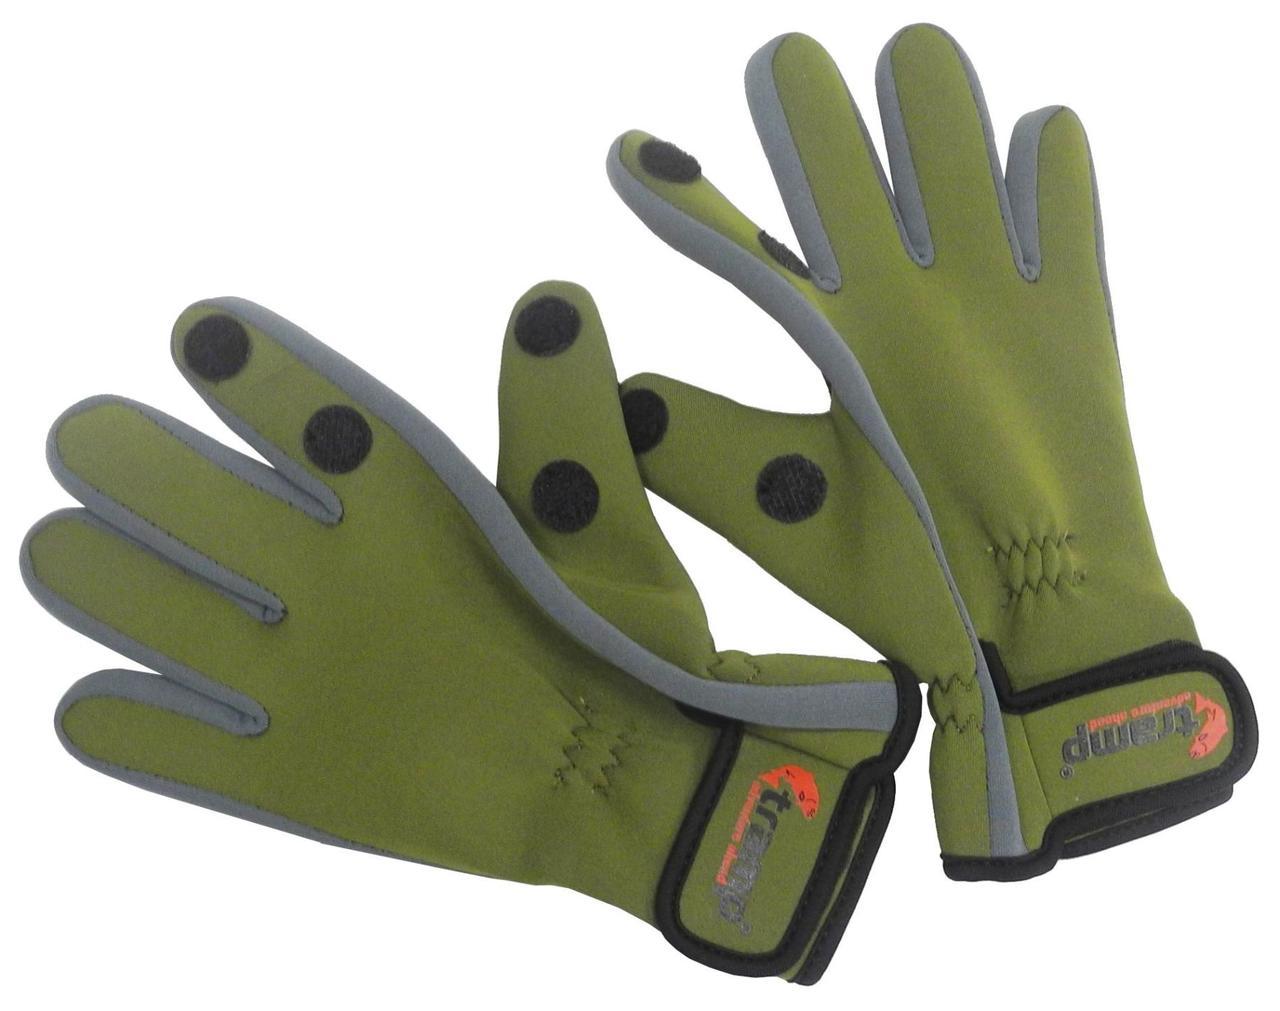 Непреновые рукавички Tramp TRGB-002-M